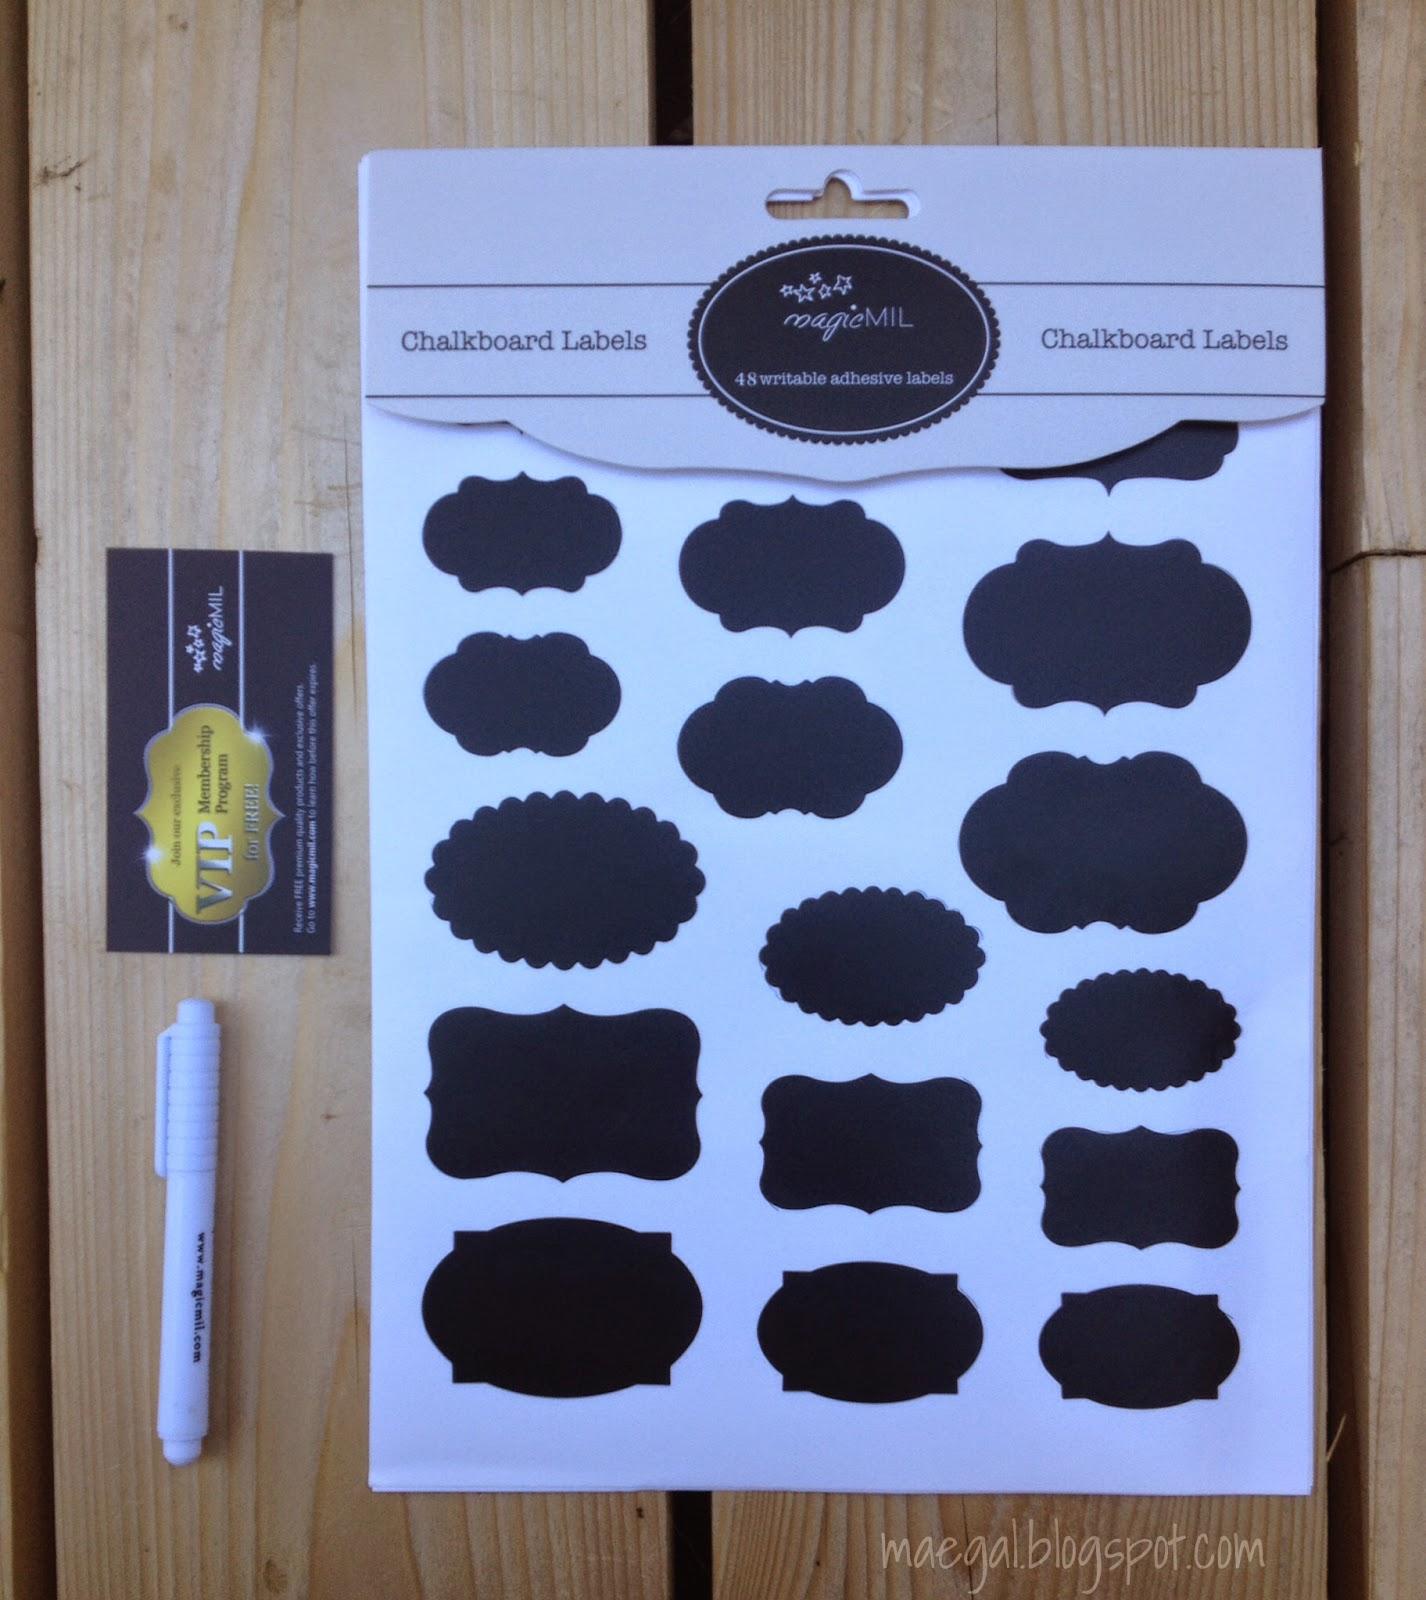 Magicmil Writable Adhesive Chalkboard Labels and Liquid Chalk Pen | maegal.blogspot.com